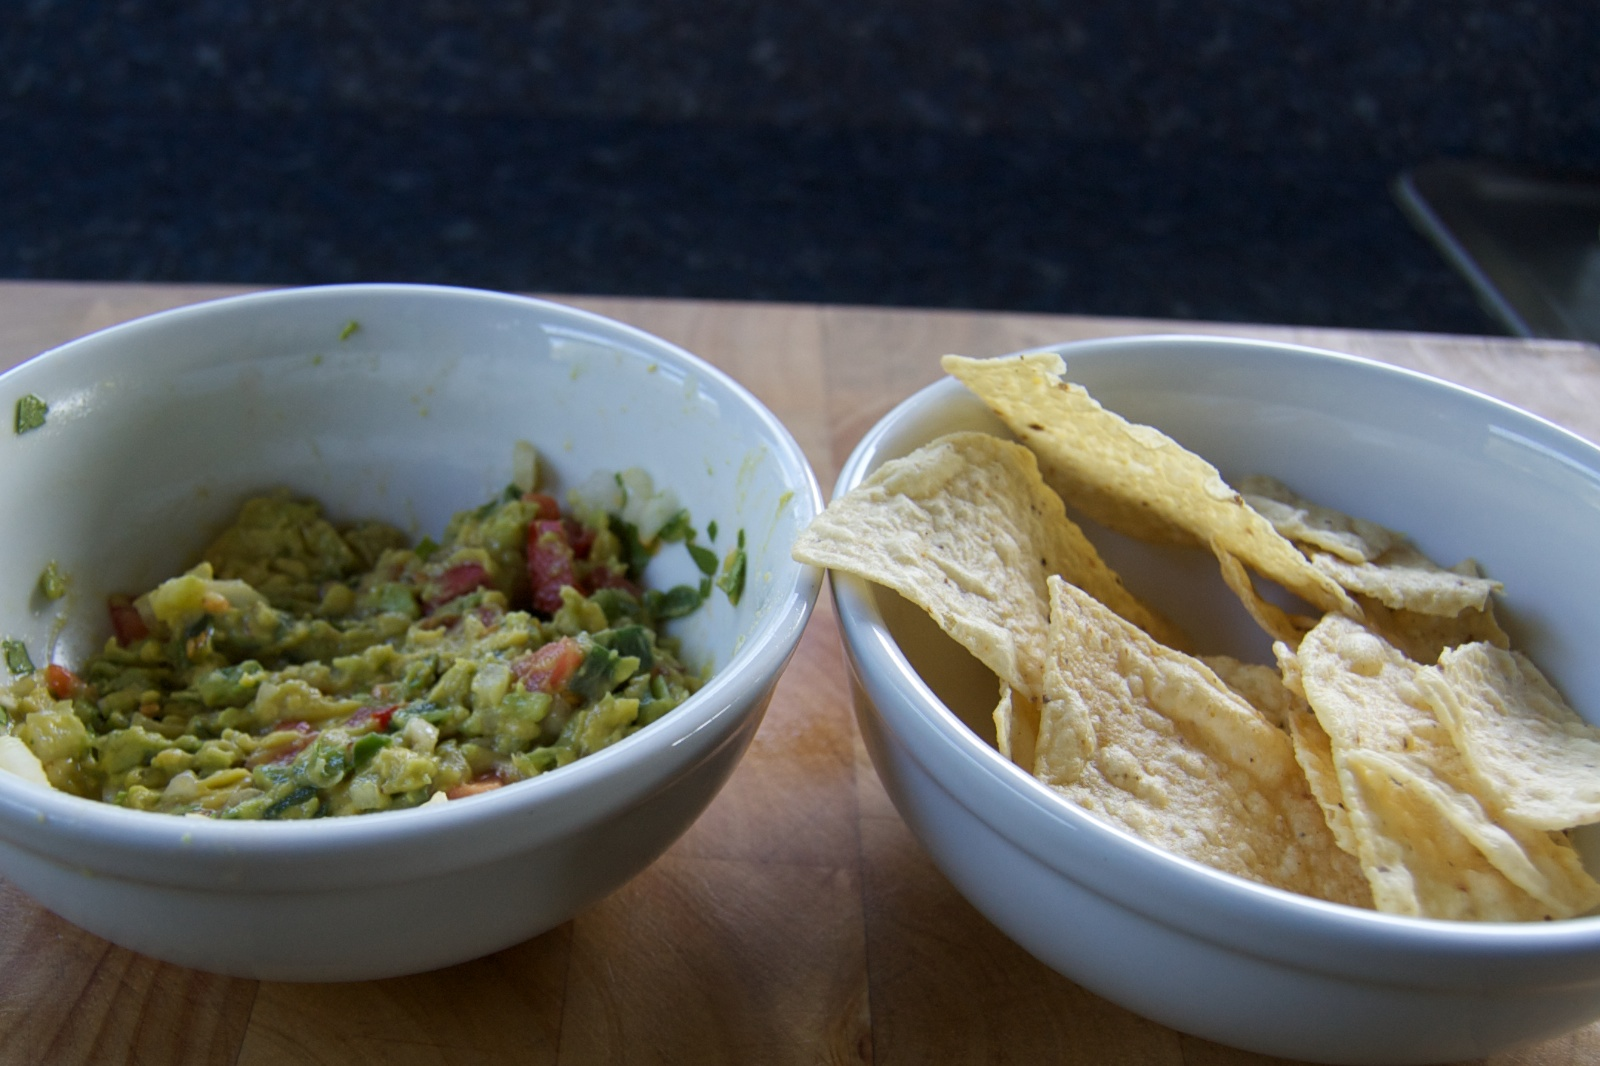 http://blog.rickk.com/food/2012/08/19/ate.2012.08.19.s1.jpg